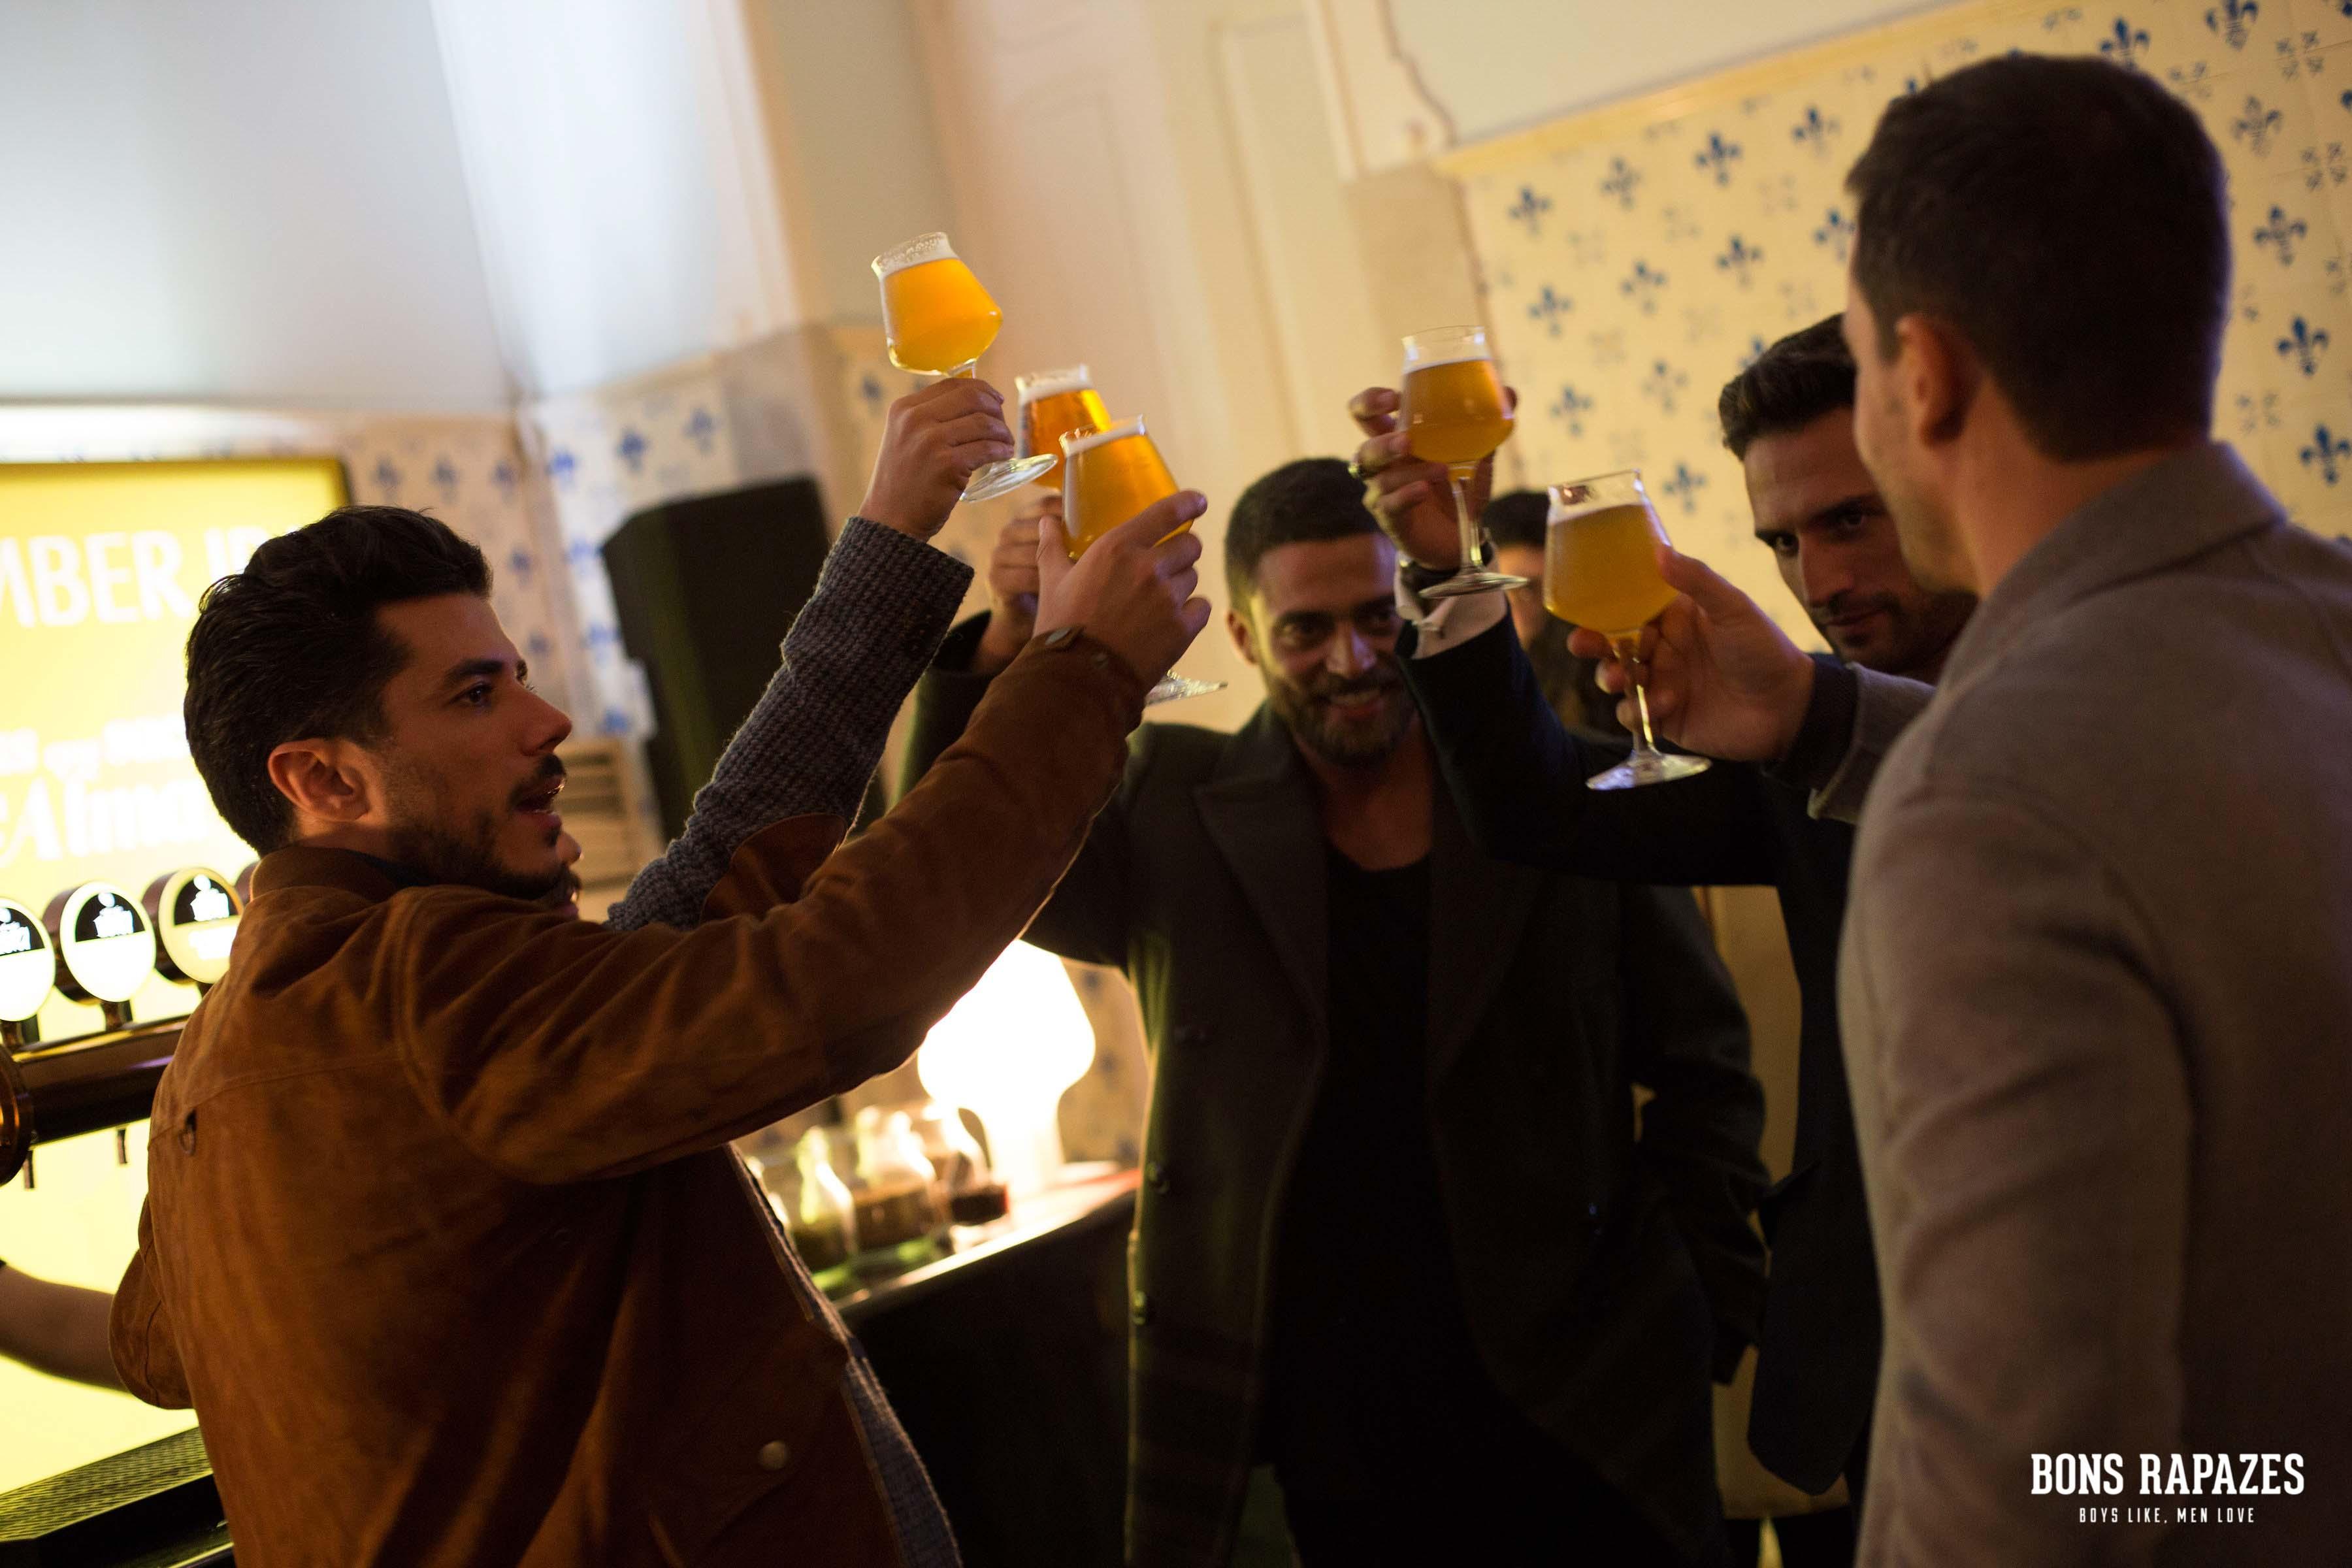 bons-rapazes-super-bock-beer-experience-30